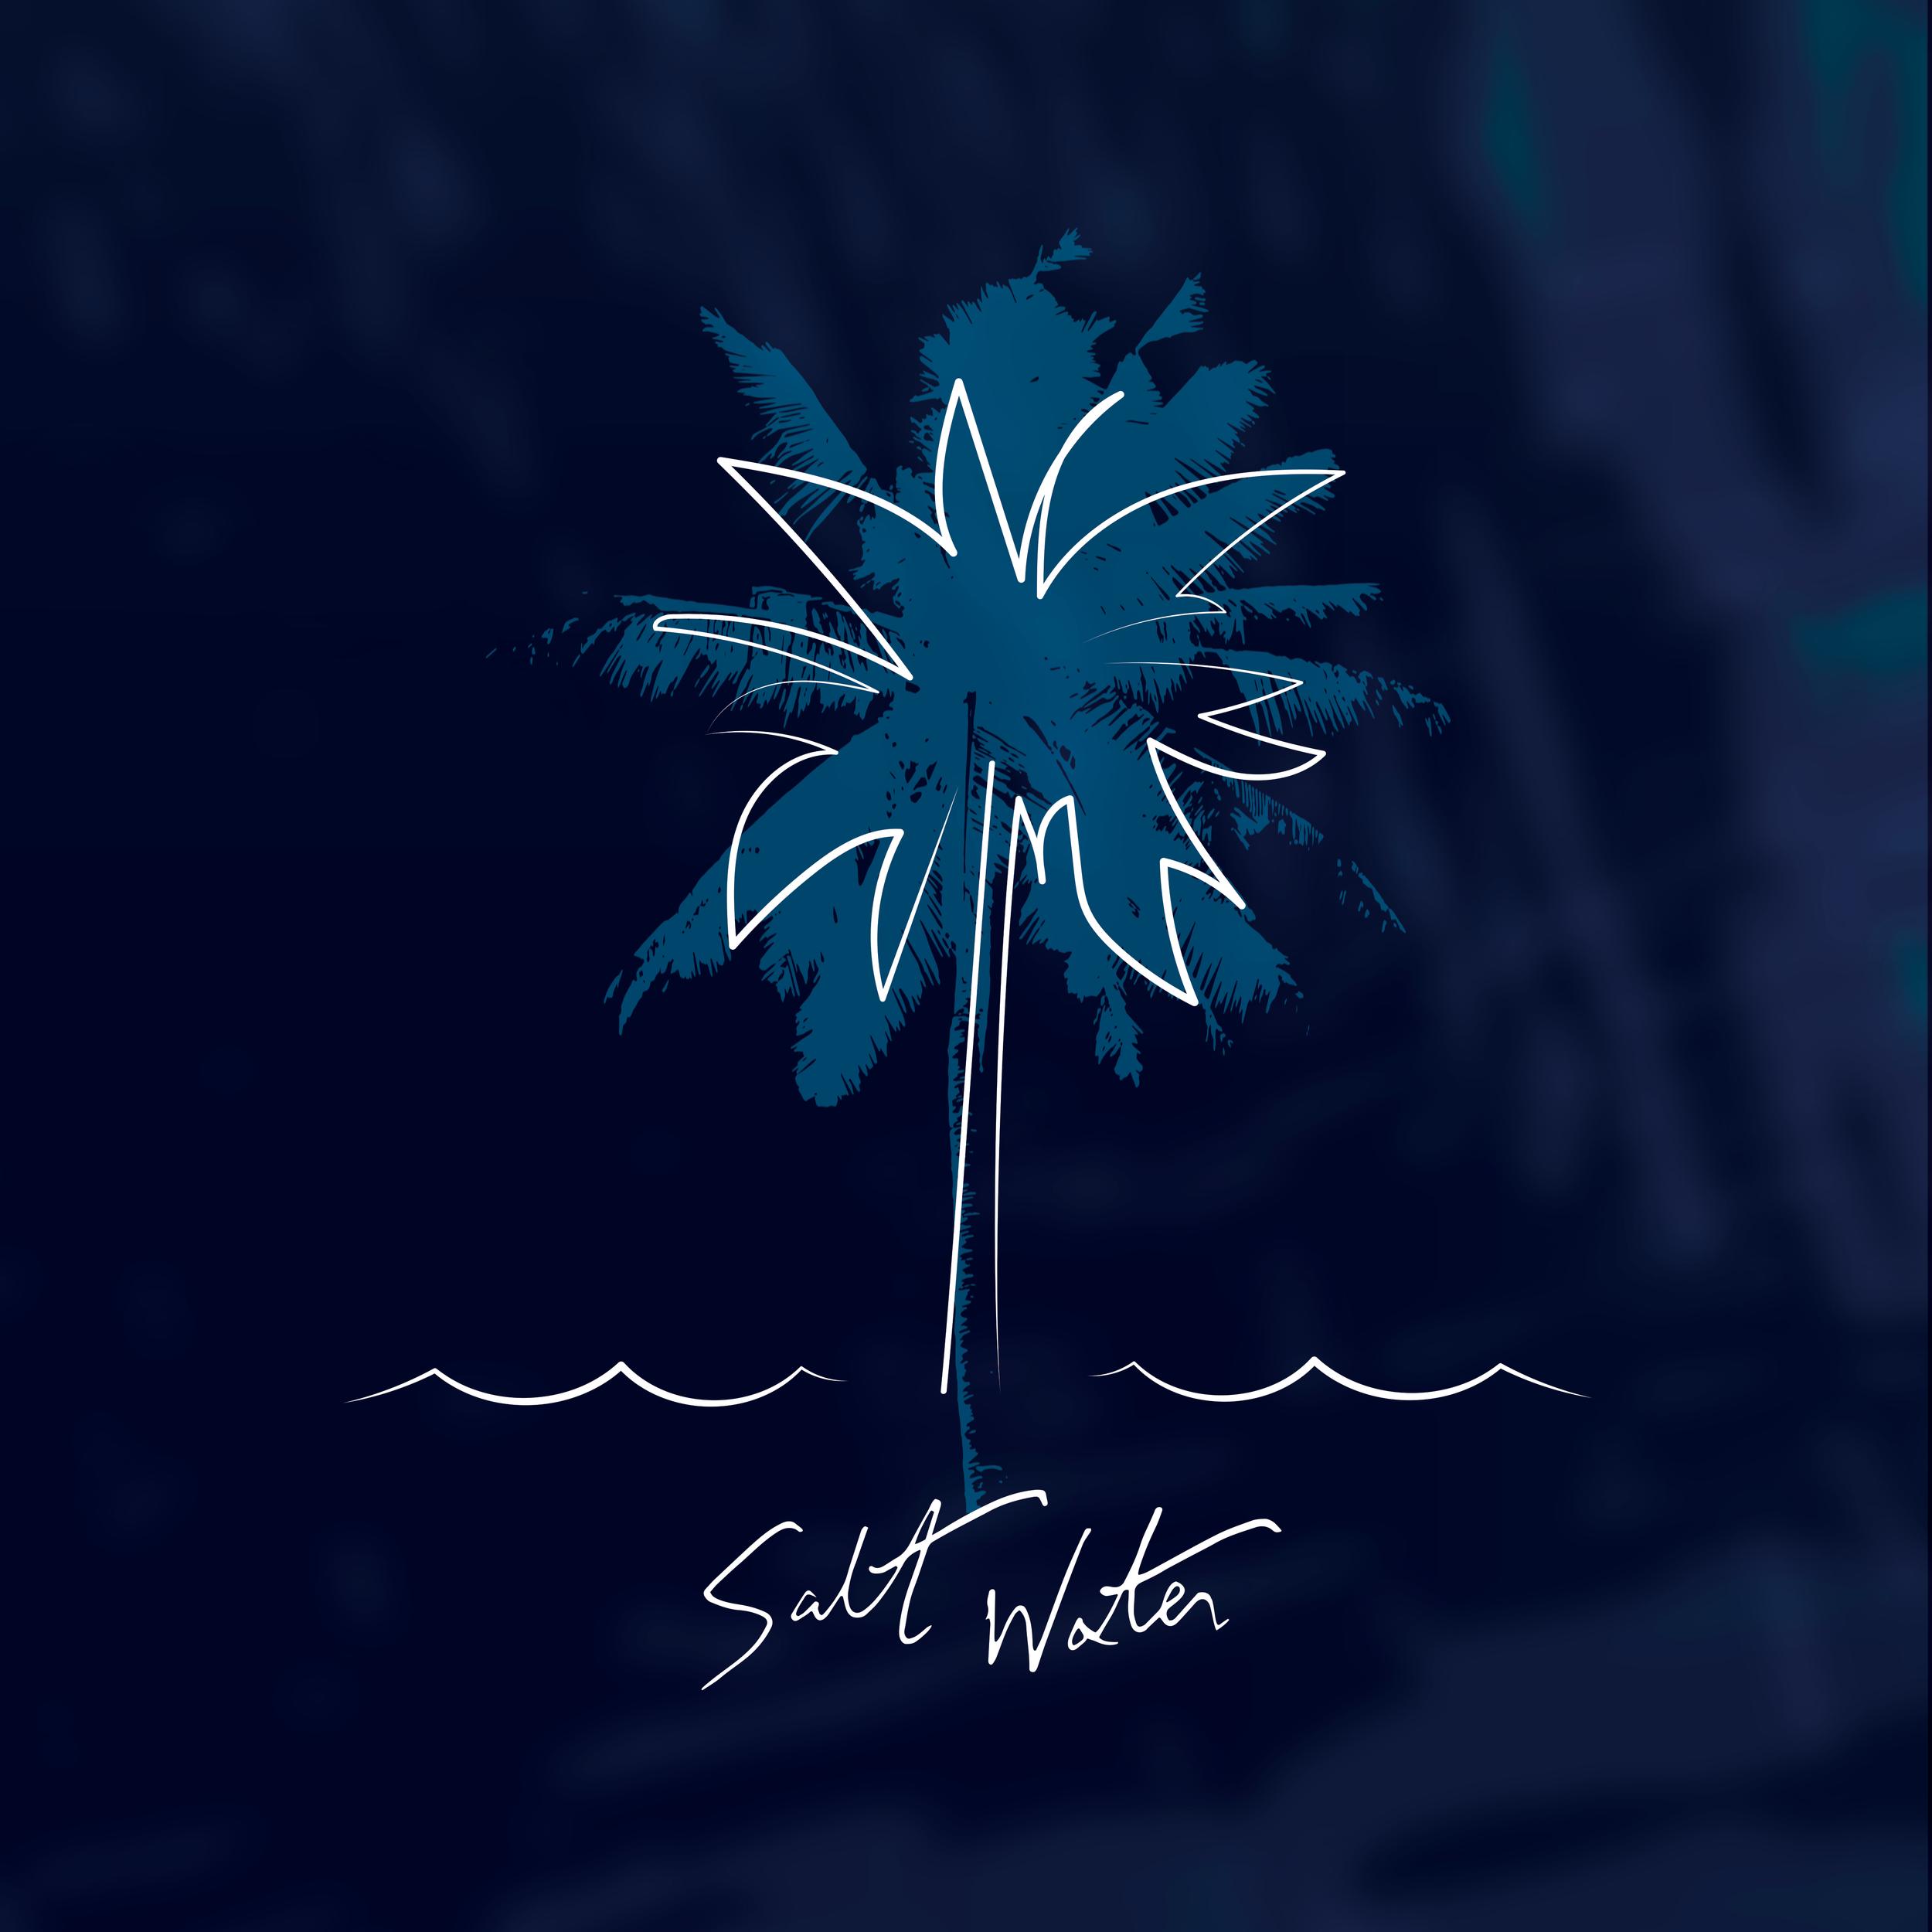 SaltWater_WEB.png